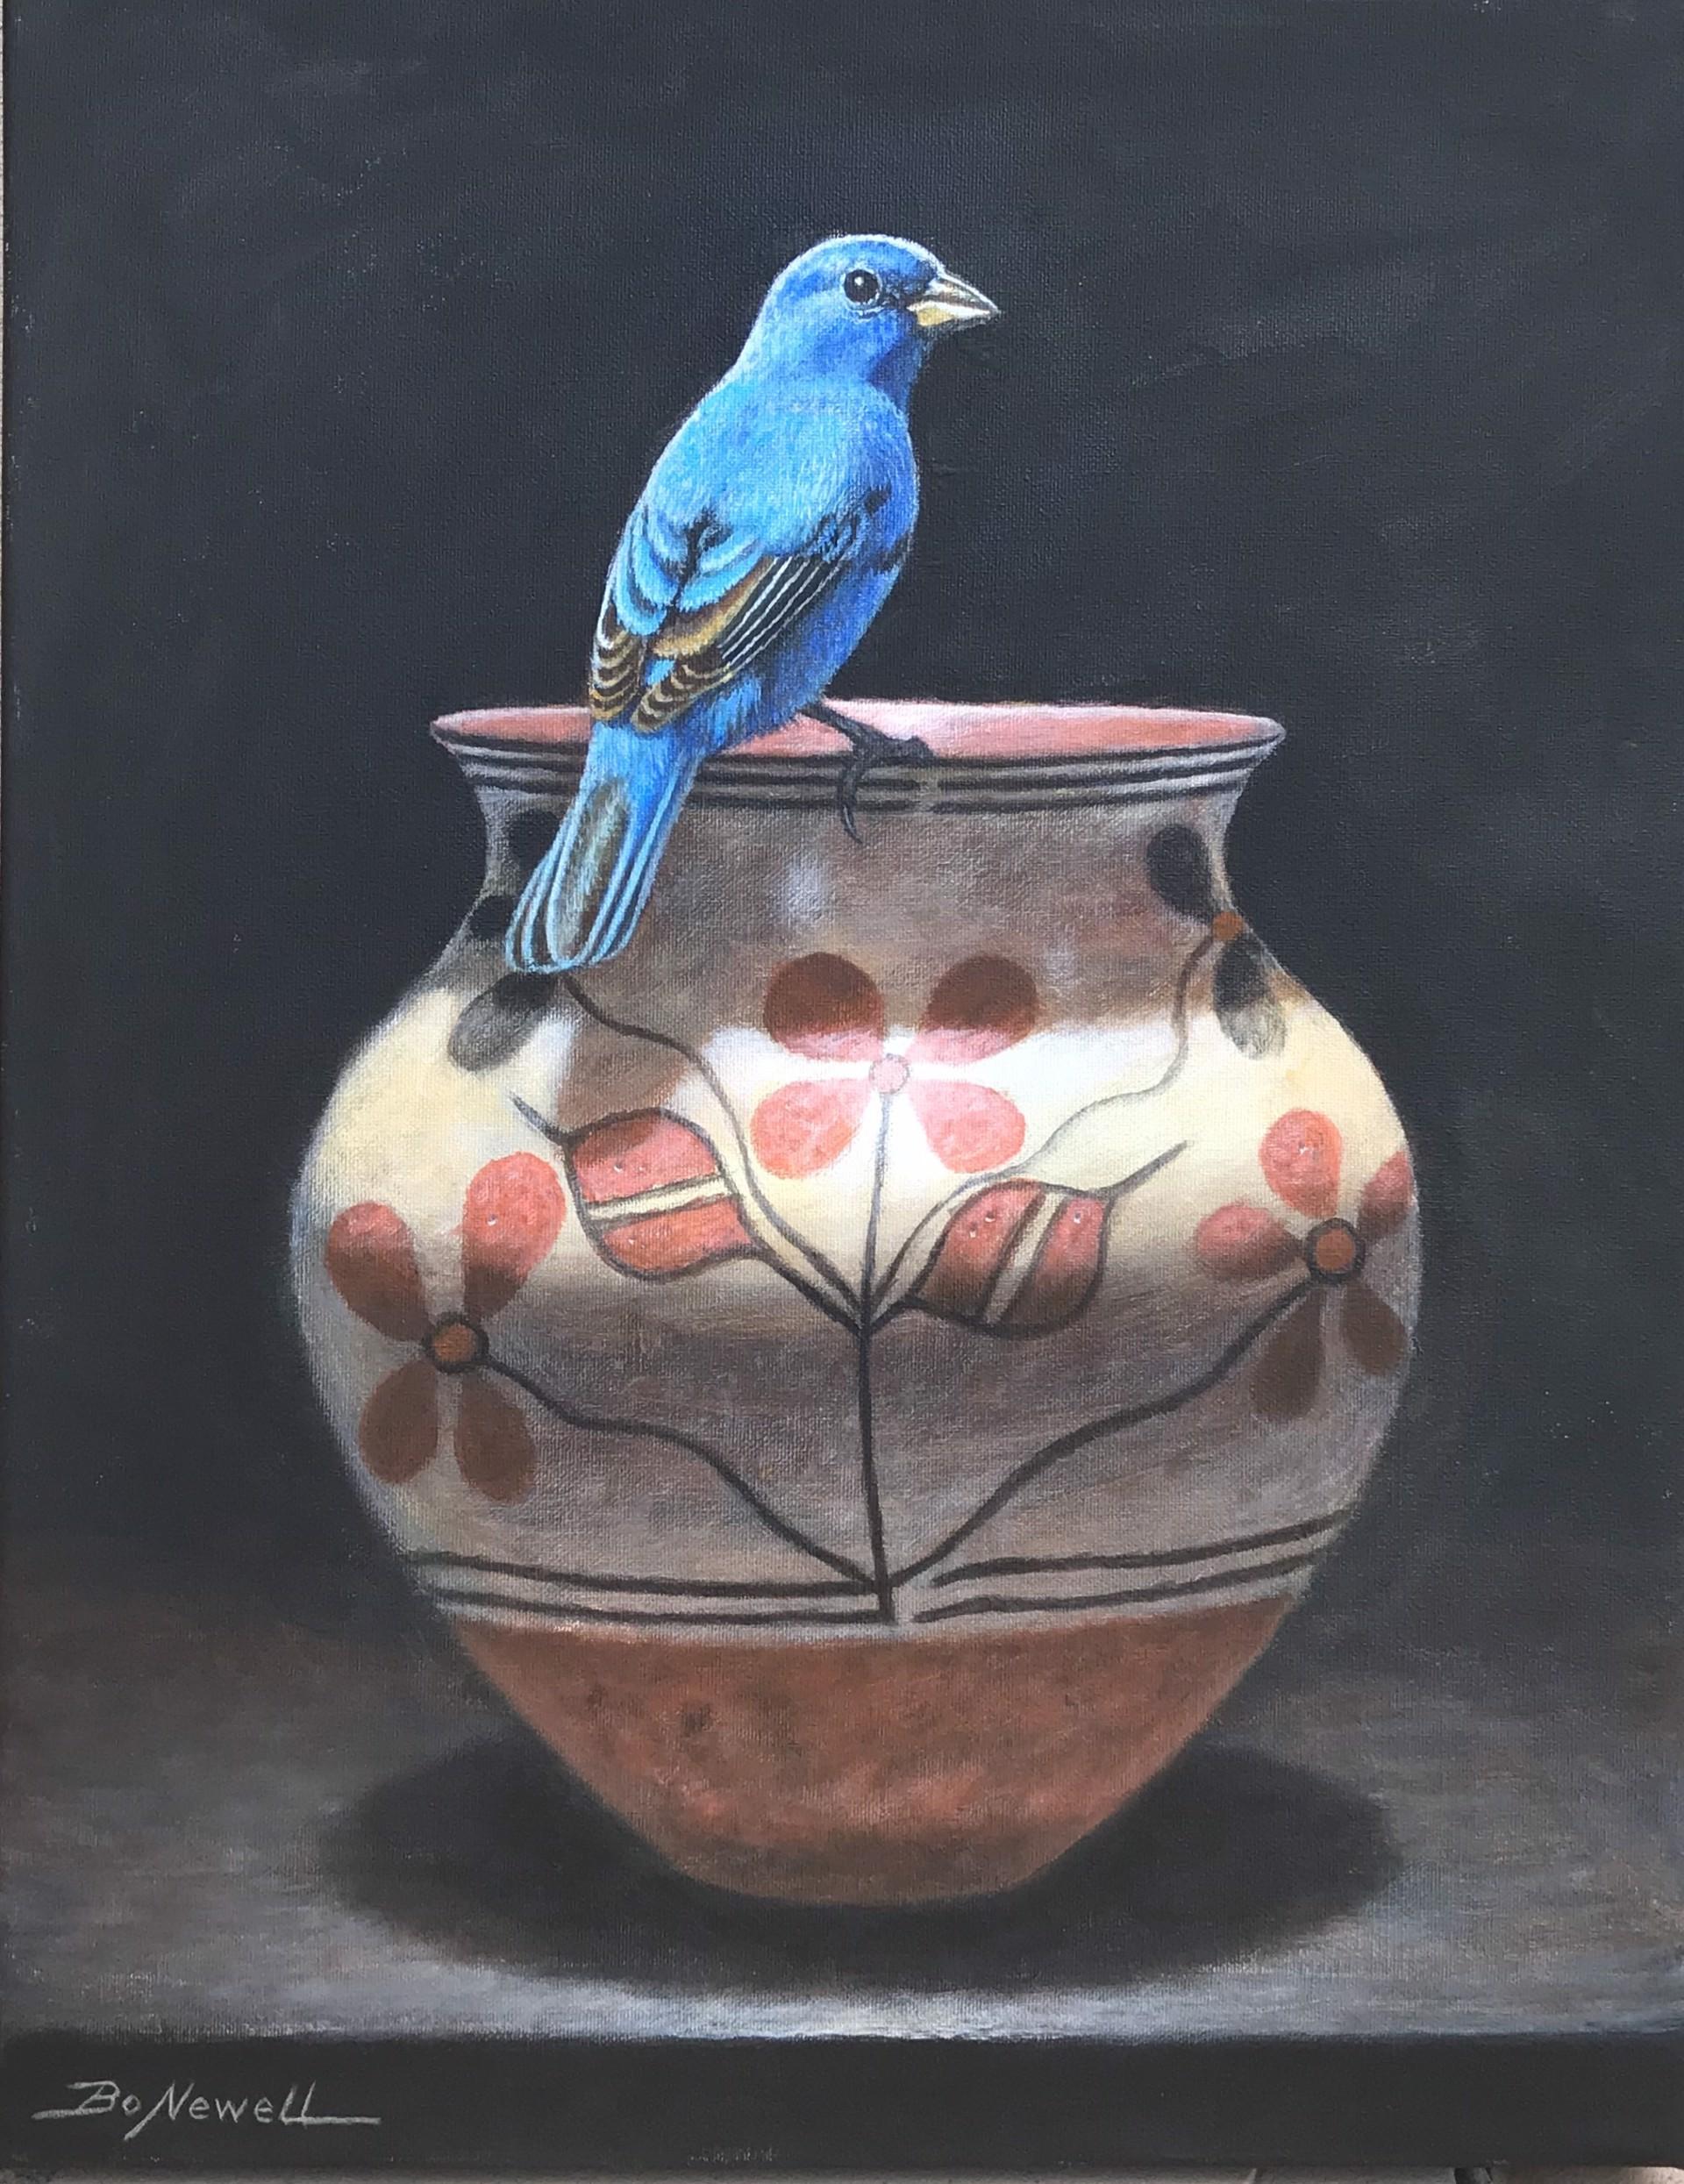 Indigo Bunting Atop Pot by Bo Newell